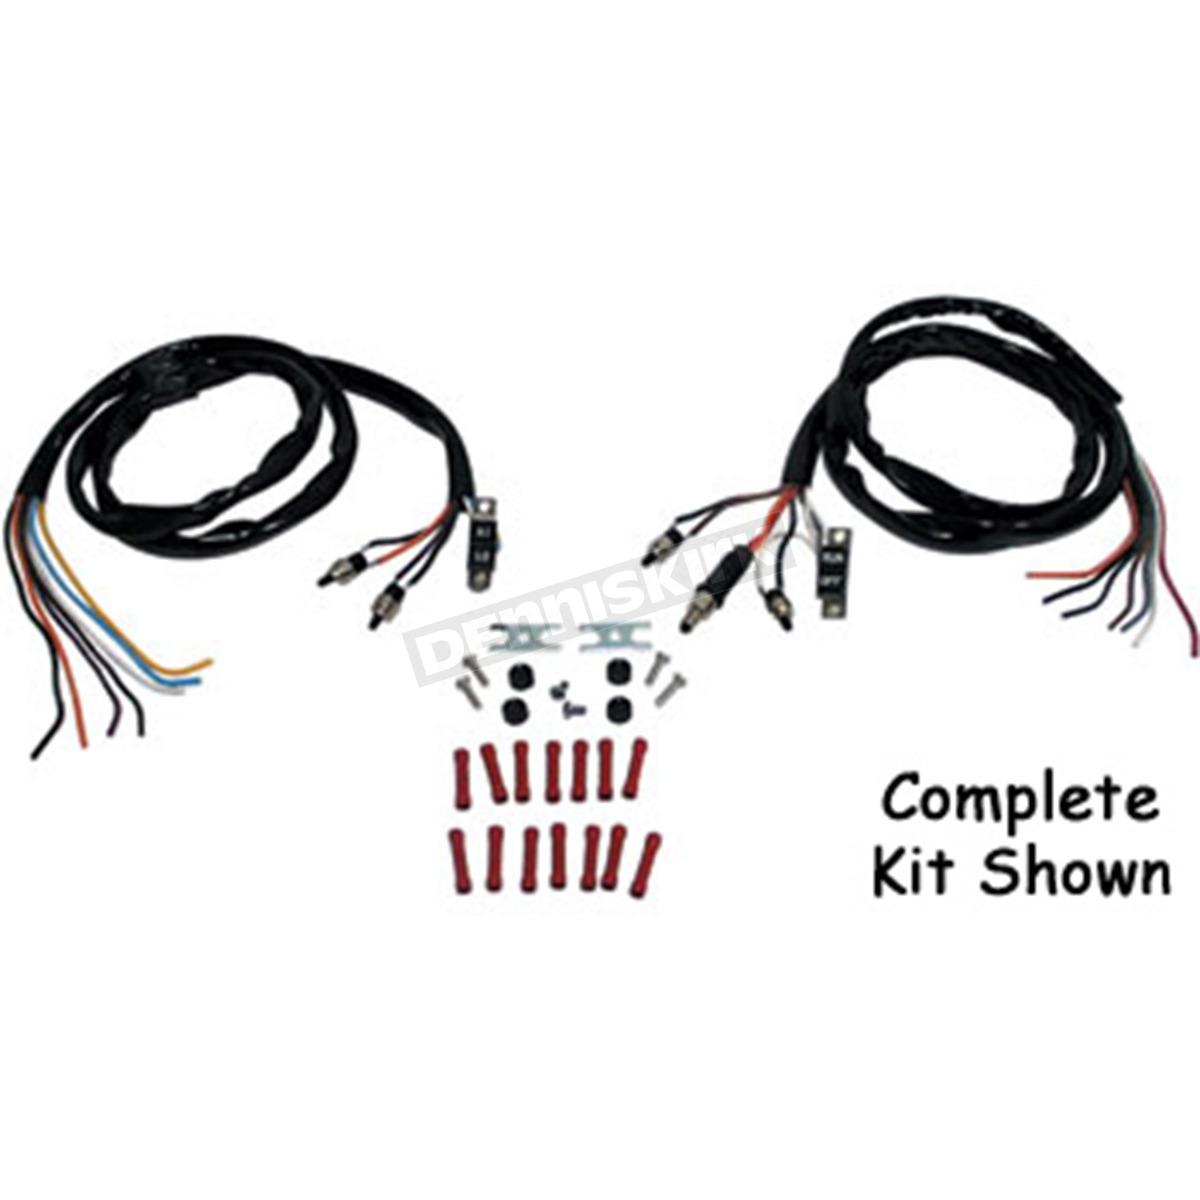 hight resolution of v factor handlebar wiring harness kit 12036